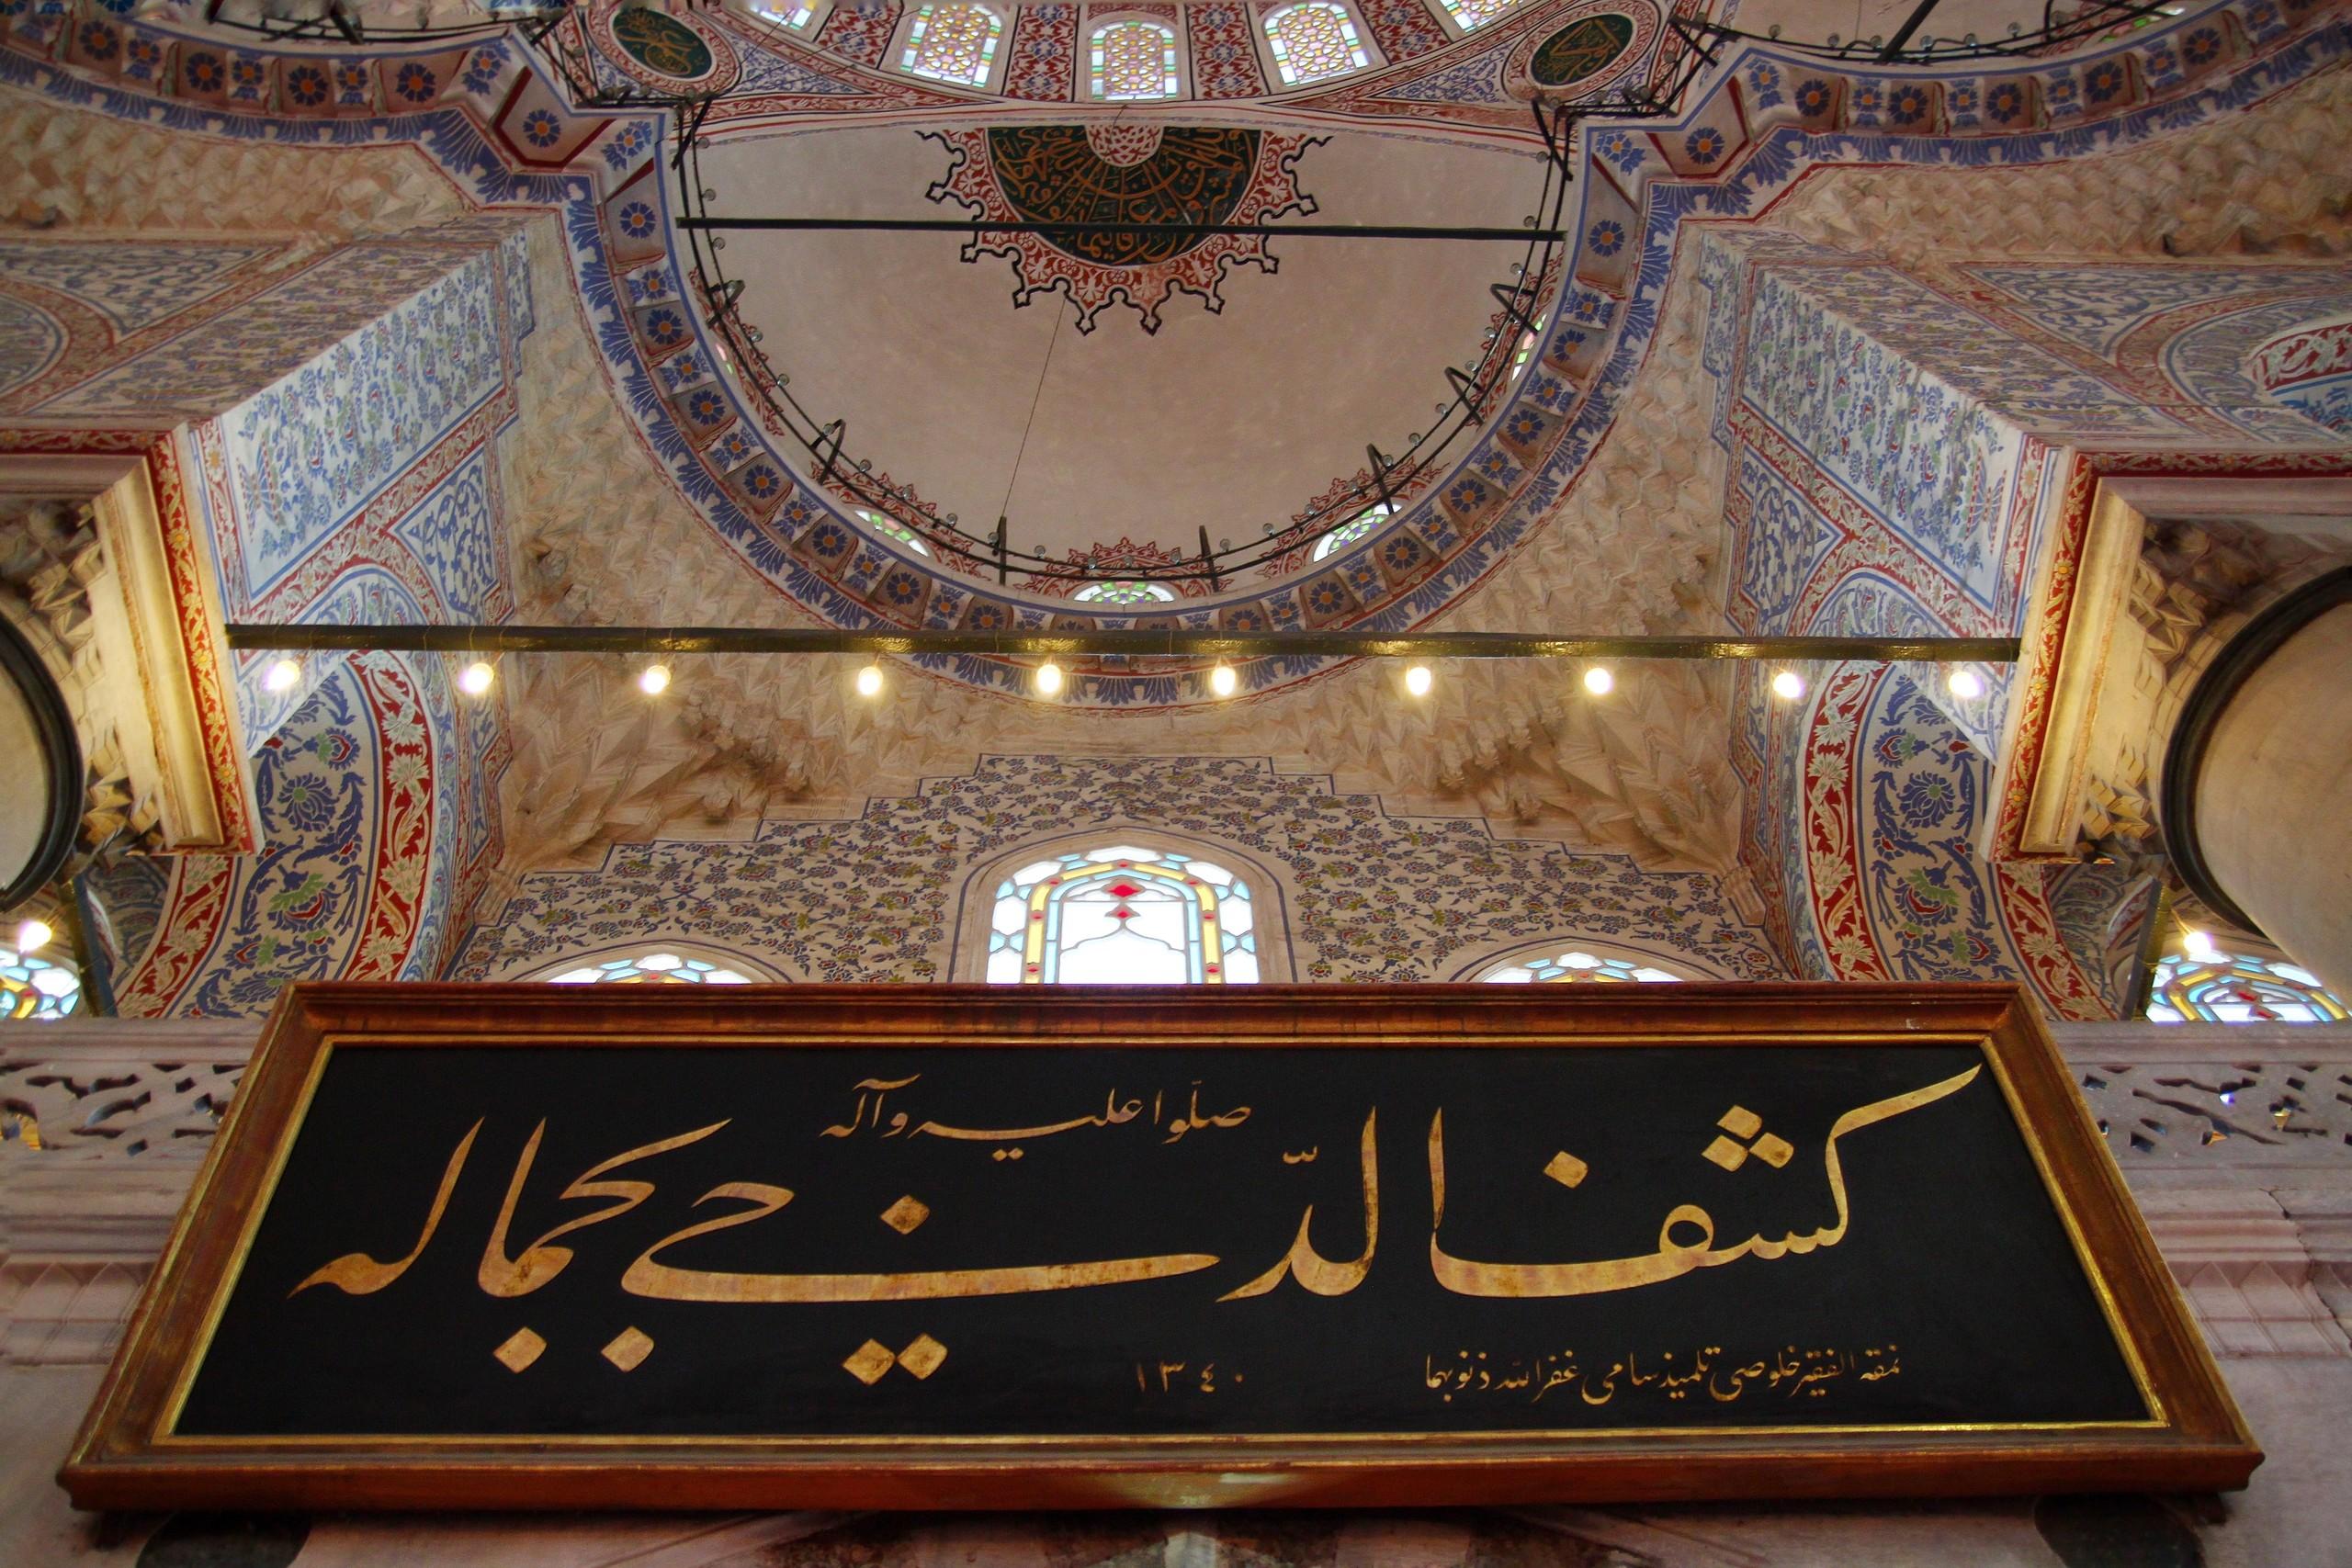 Pırlantadan Kubbeler #5: Sultanahmed - X48ZaD - Pırlantadan Kubbeler #5: Sultanahmed